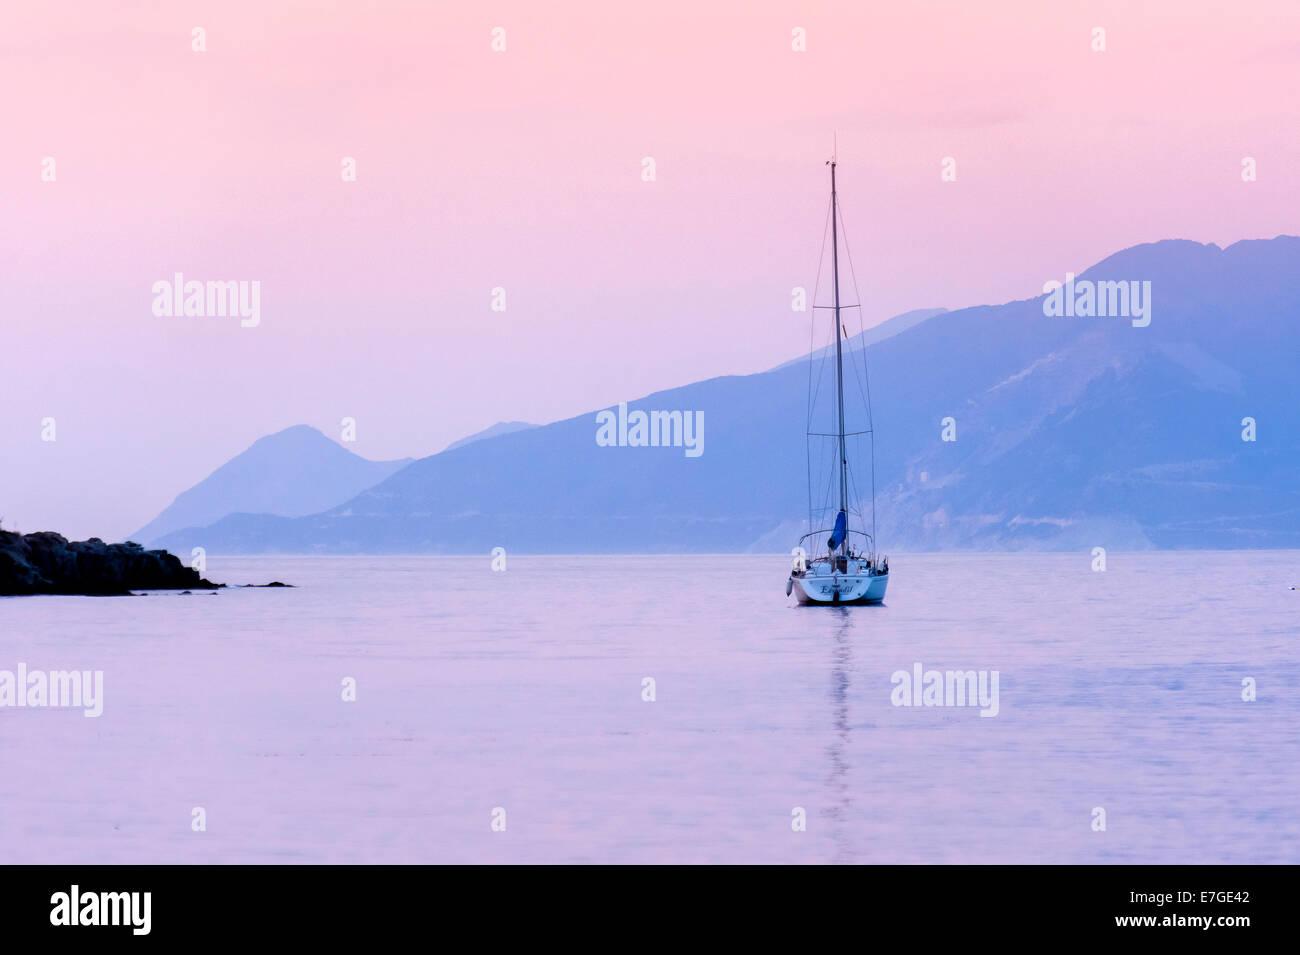 Europe, France, Corsica, Haute Corse, Cap Corse. Saint Florent. Anchored boat at dusk. - Stock Image